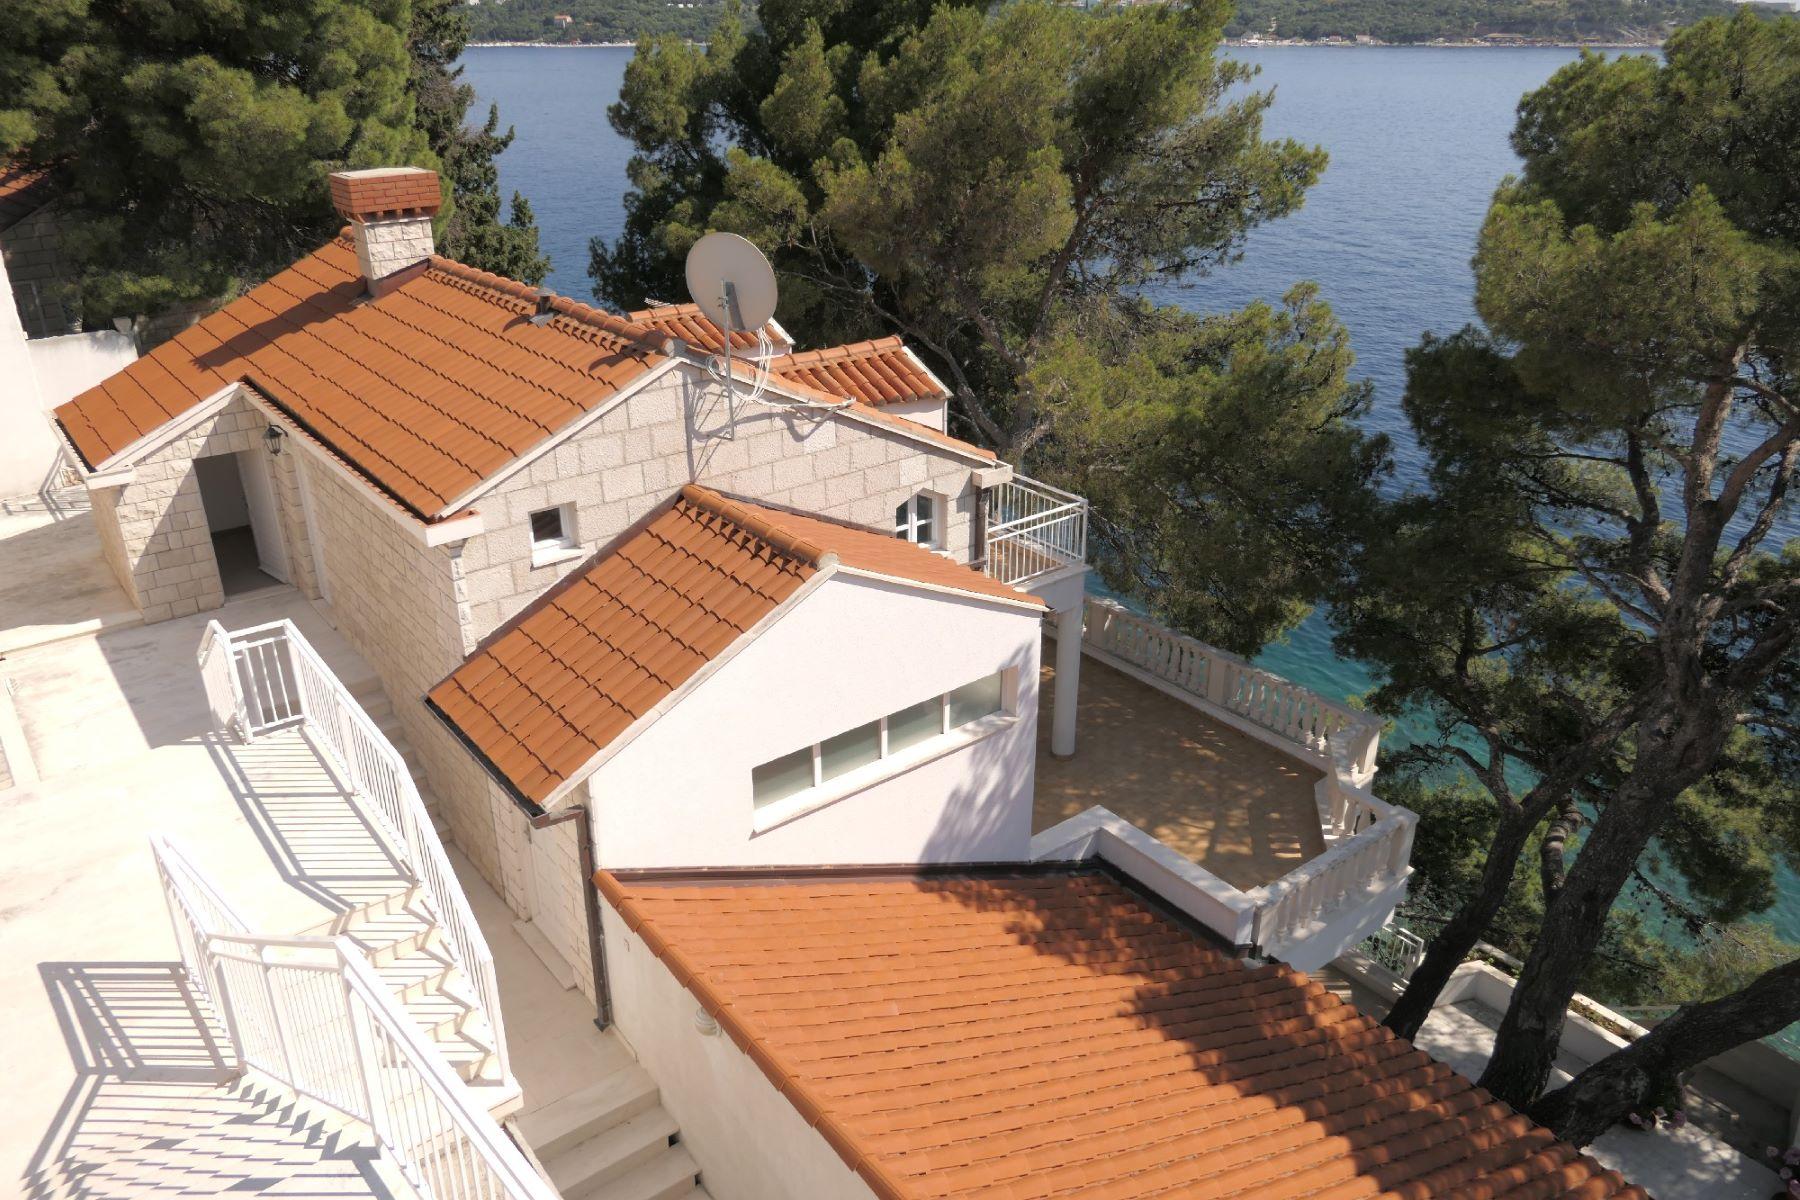 Maison unifamiliale pour l à vendre à Villa Heaven Other Dubrovnik Neretva, Dubrovnik Neretva, 20000 Croatia